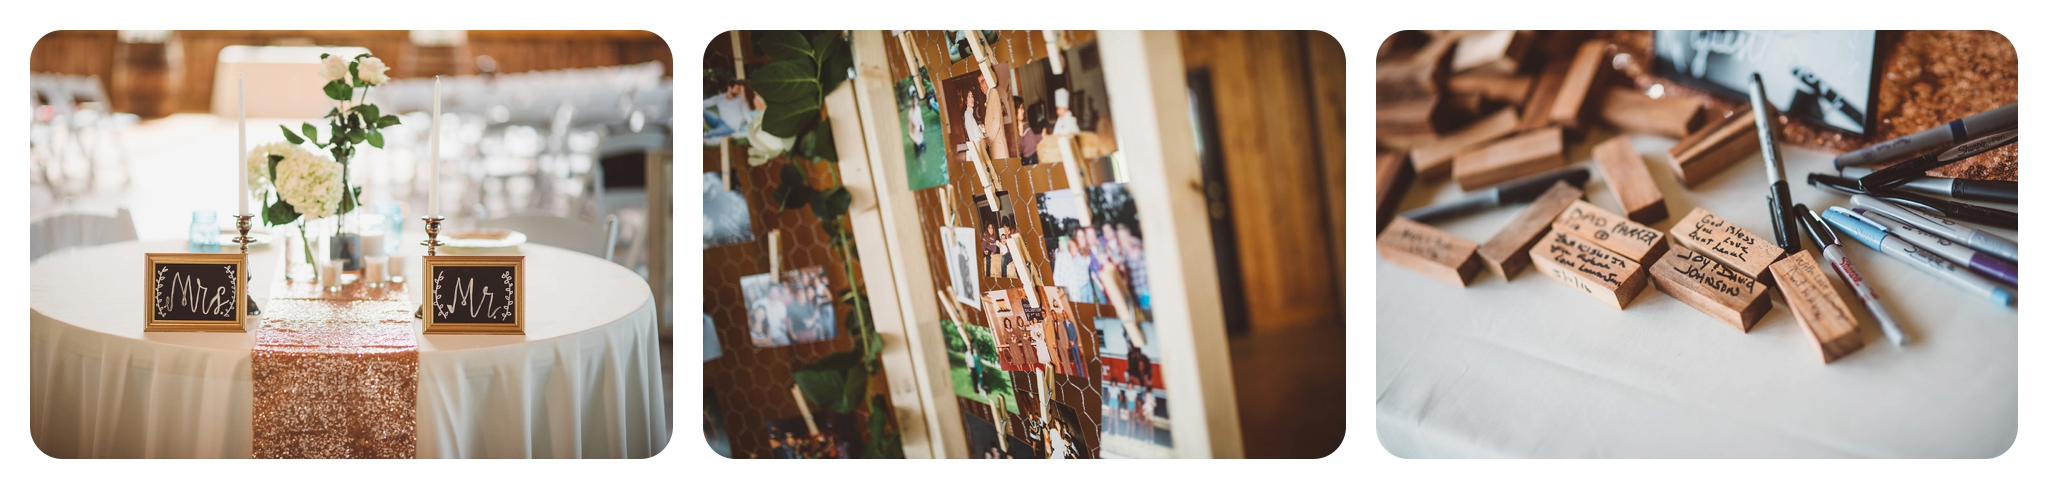 Braeloch-Weddings-Wedding-Photographer-Pat-Cori-Photography-015.jpg